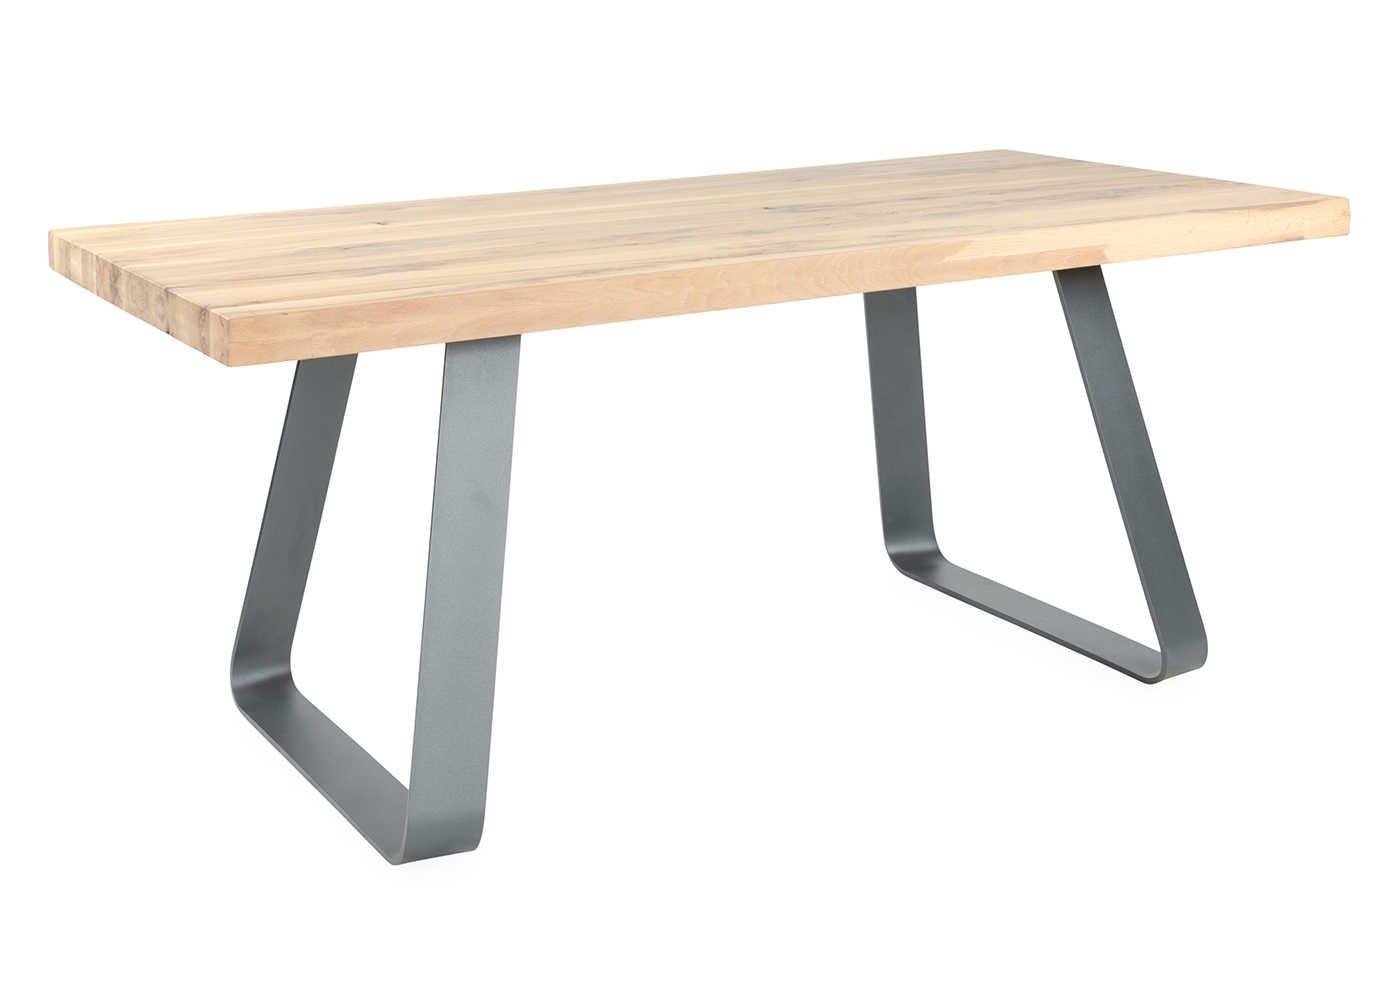 Sorrento Dining Table in Natural Light Oak